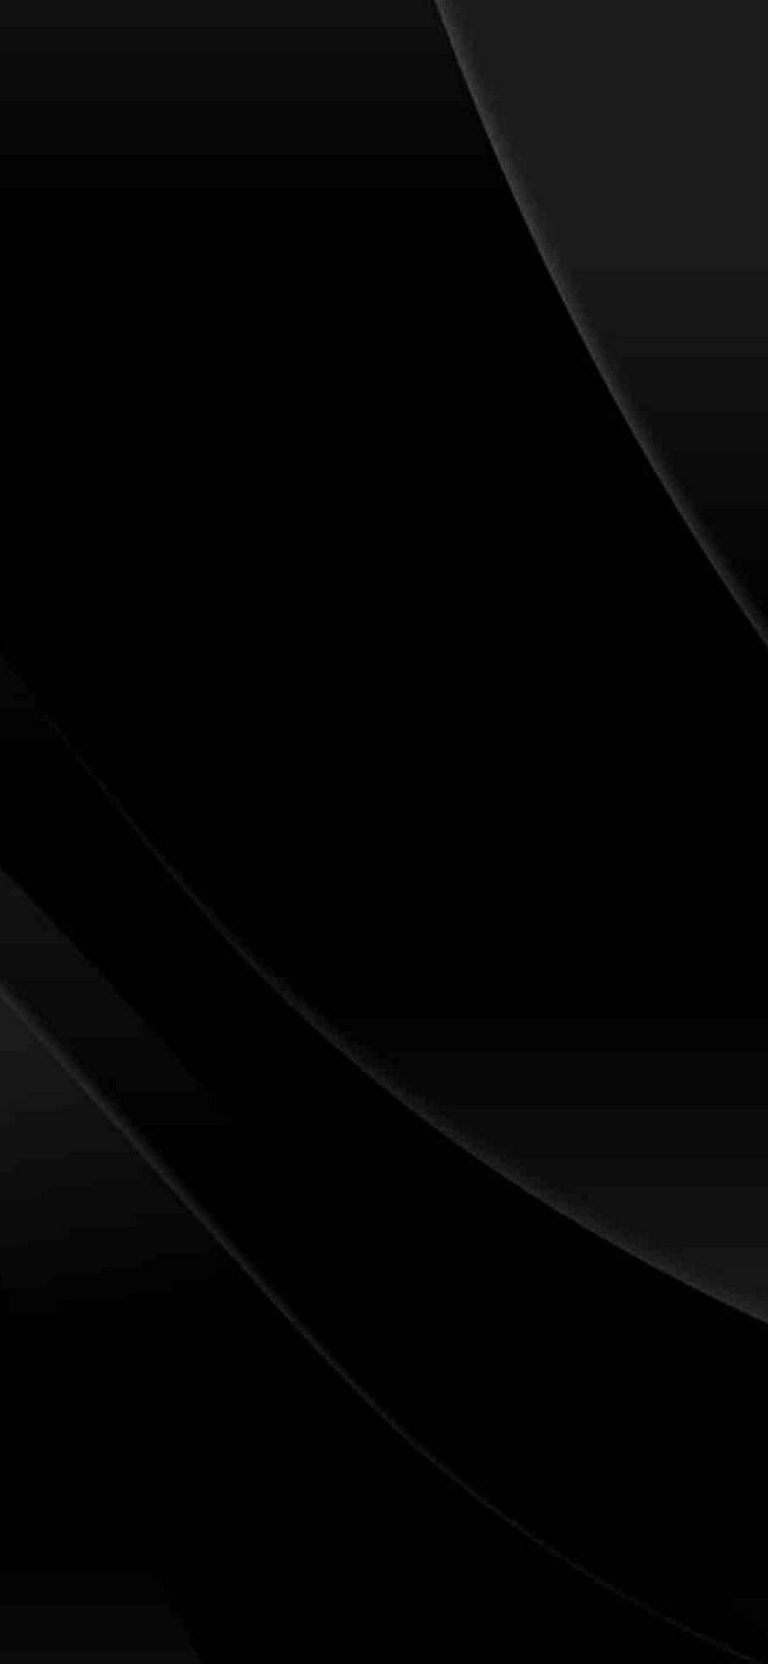 Dark Phone Wallpaper 009 1080x2340 768x1664